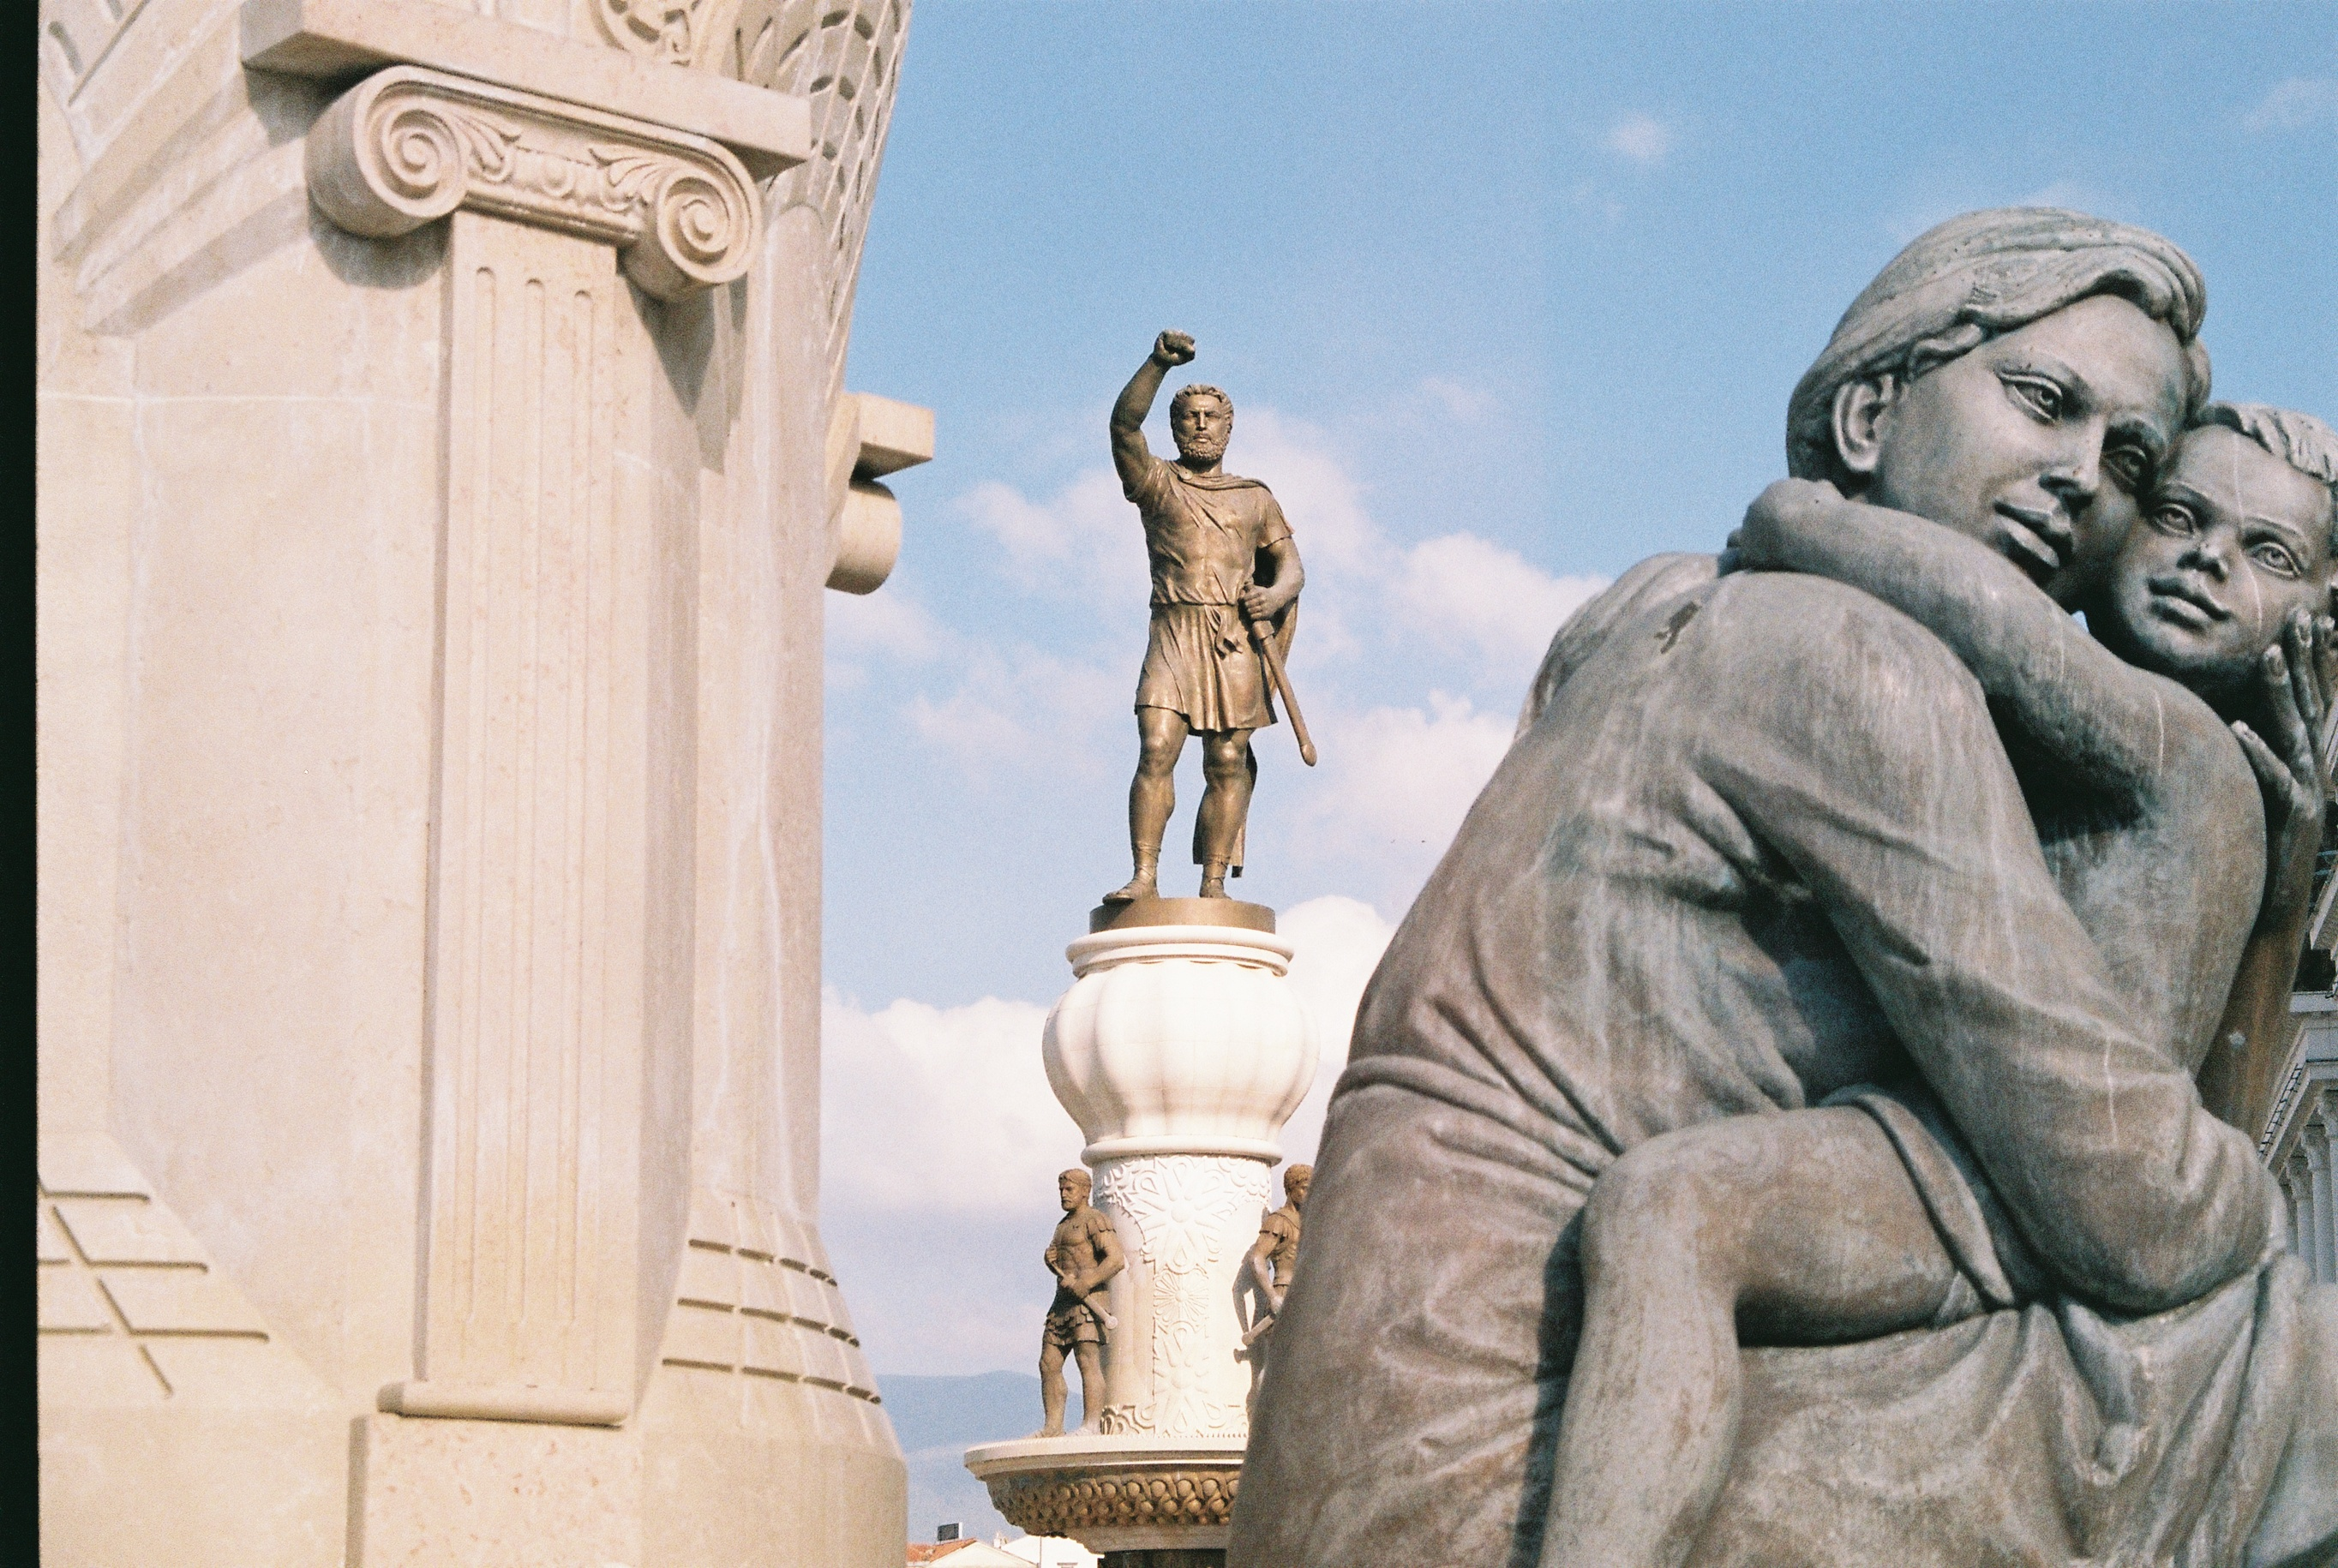 Details of Skopje [2017] by Valentina Orlando